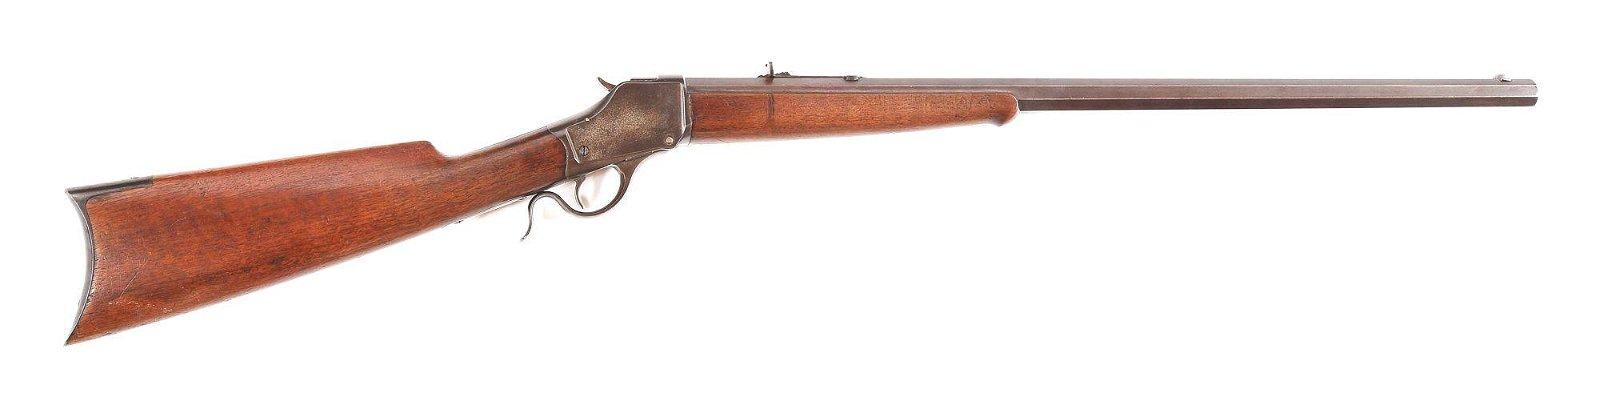 (A) WINCHESTER MODEL 1885 .38-55 SINGLE SHOT RIFLE.